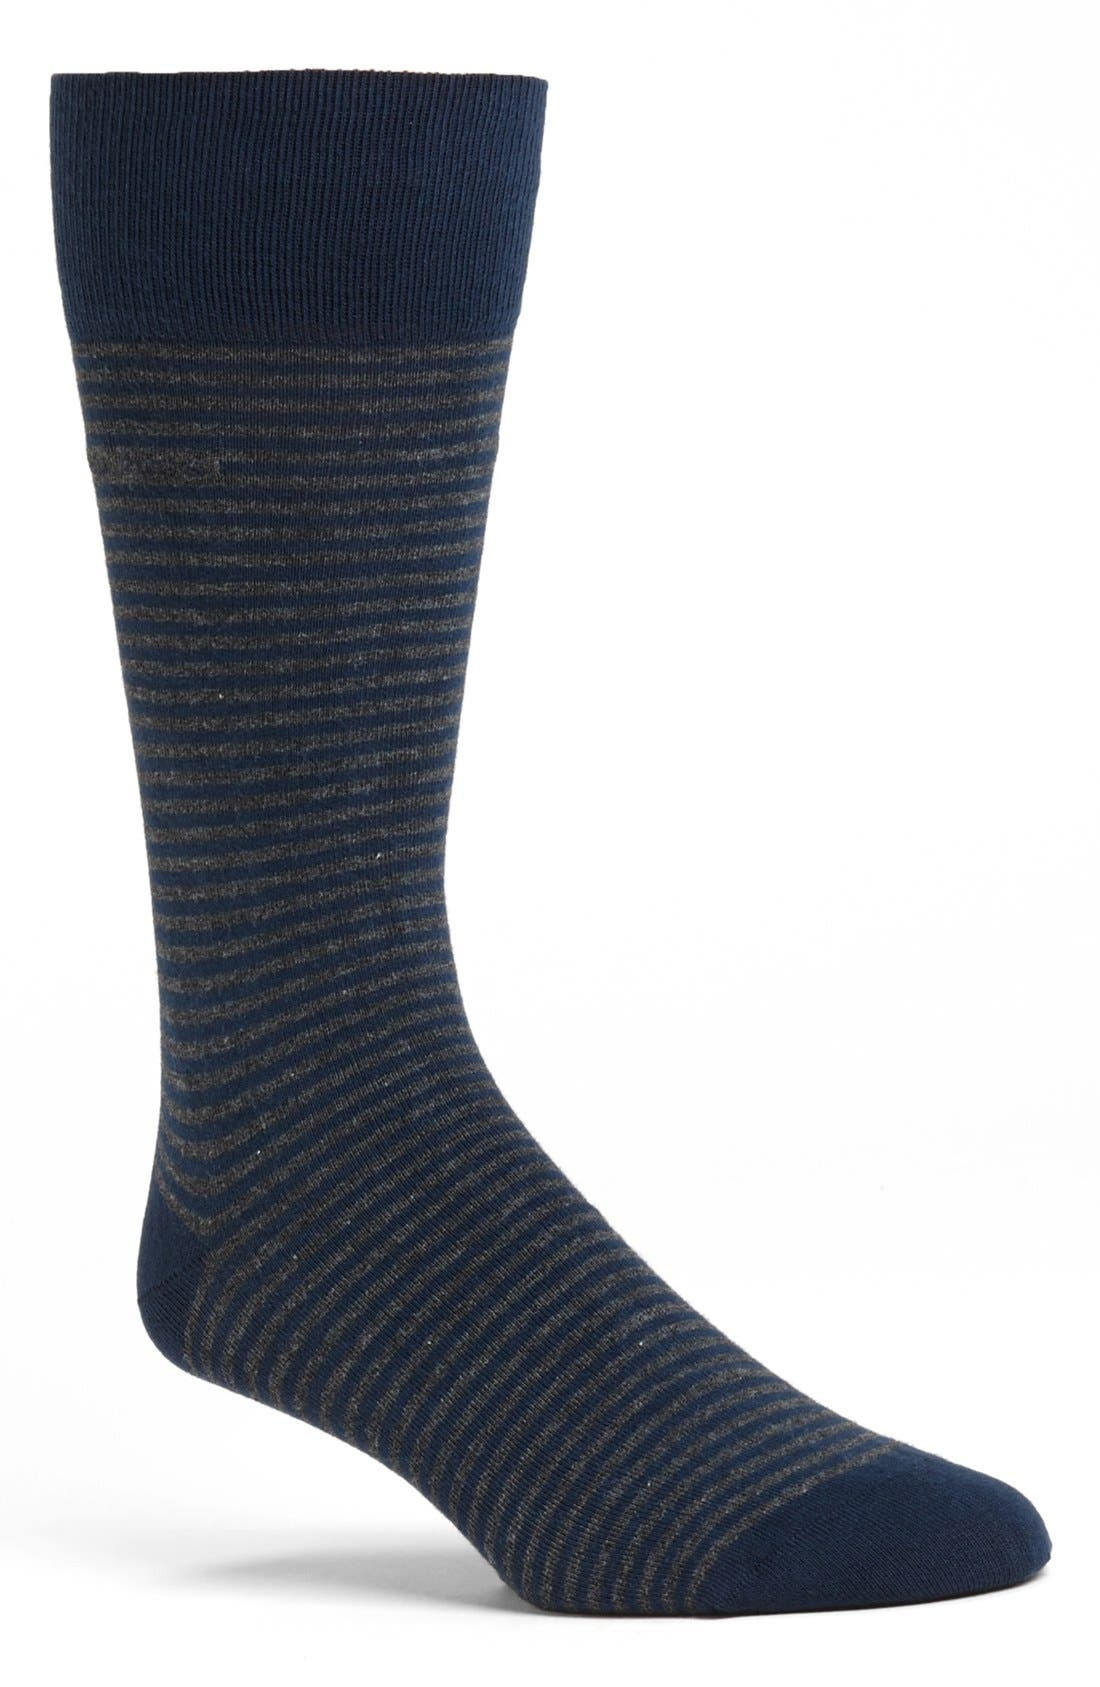 HUGO BOSS 'Marc' Socks, Main, color, 404